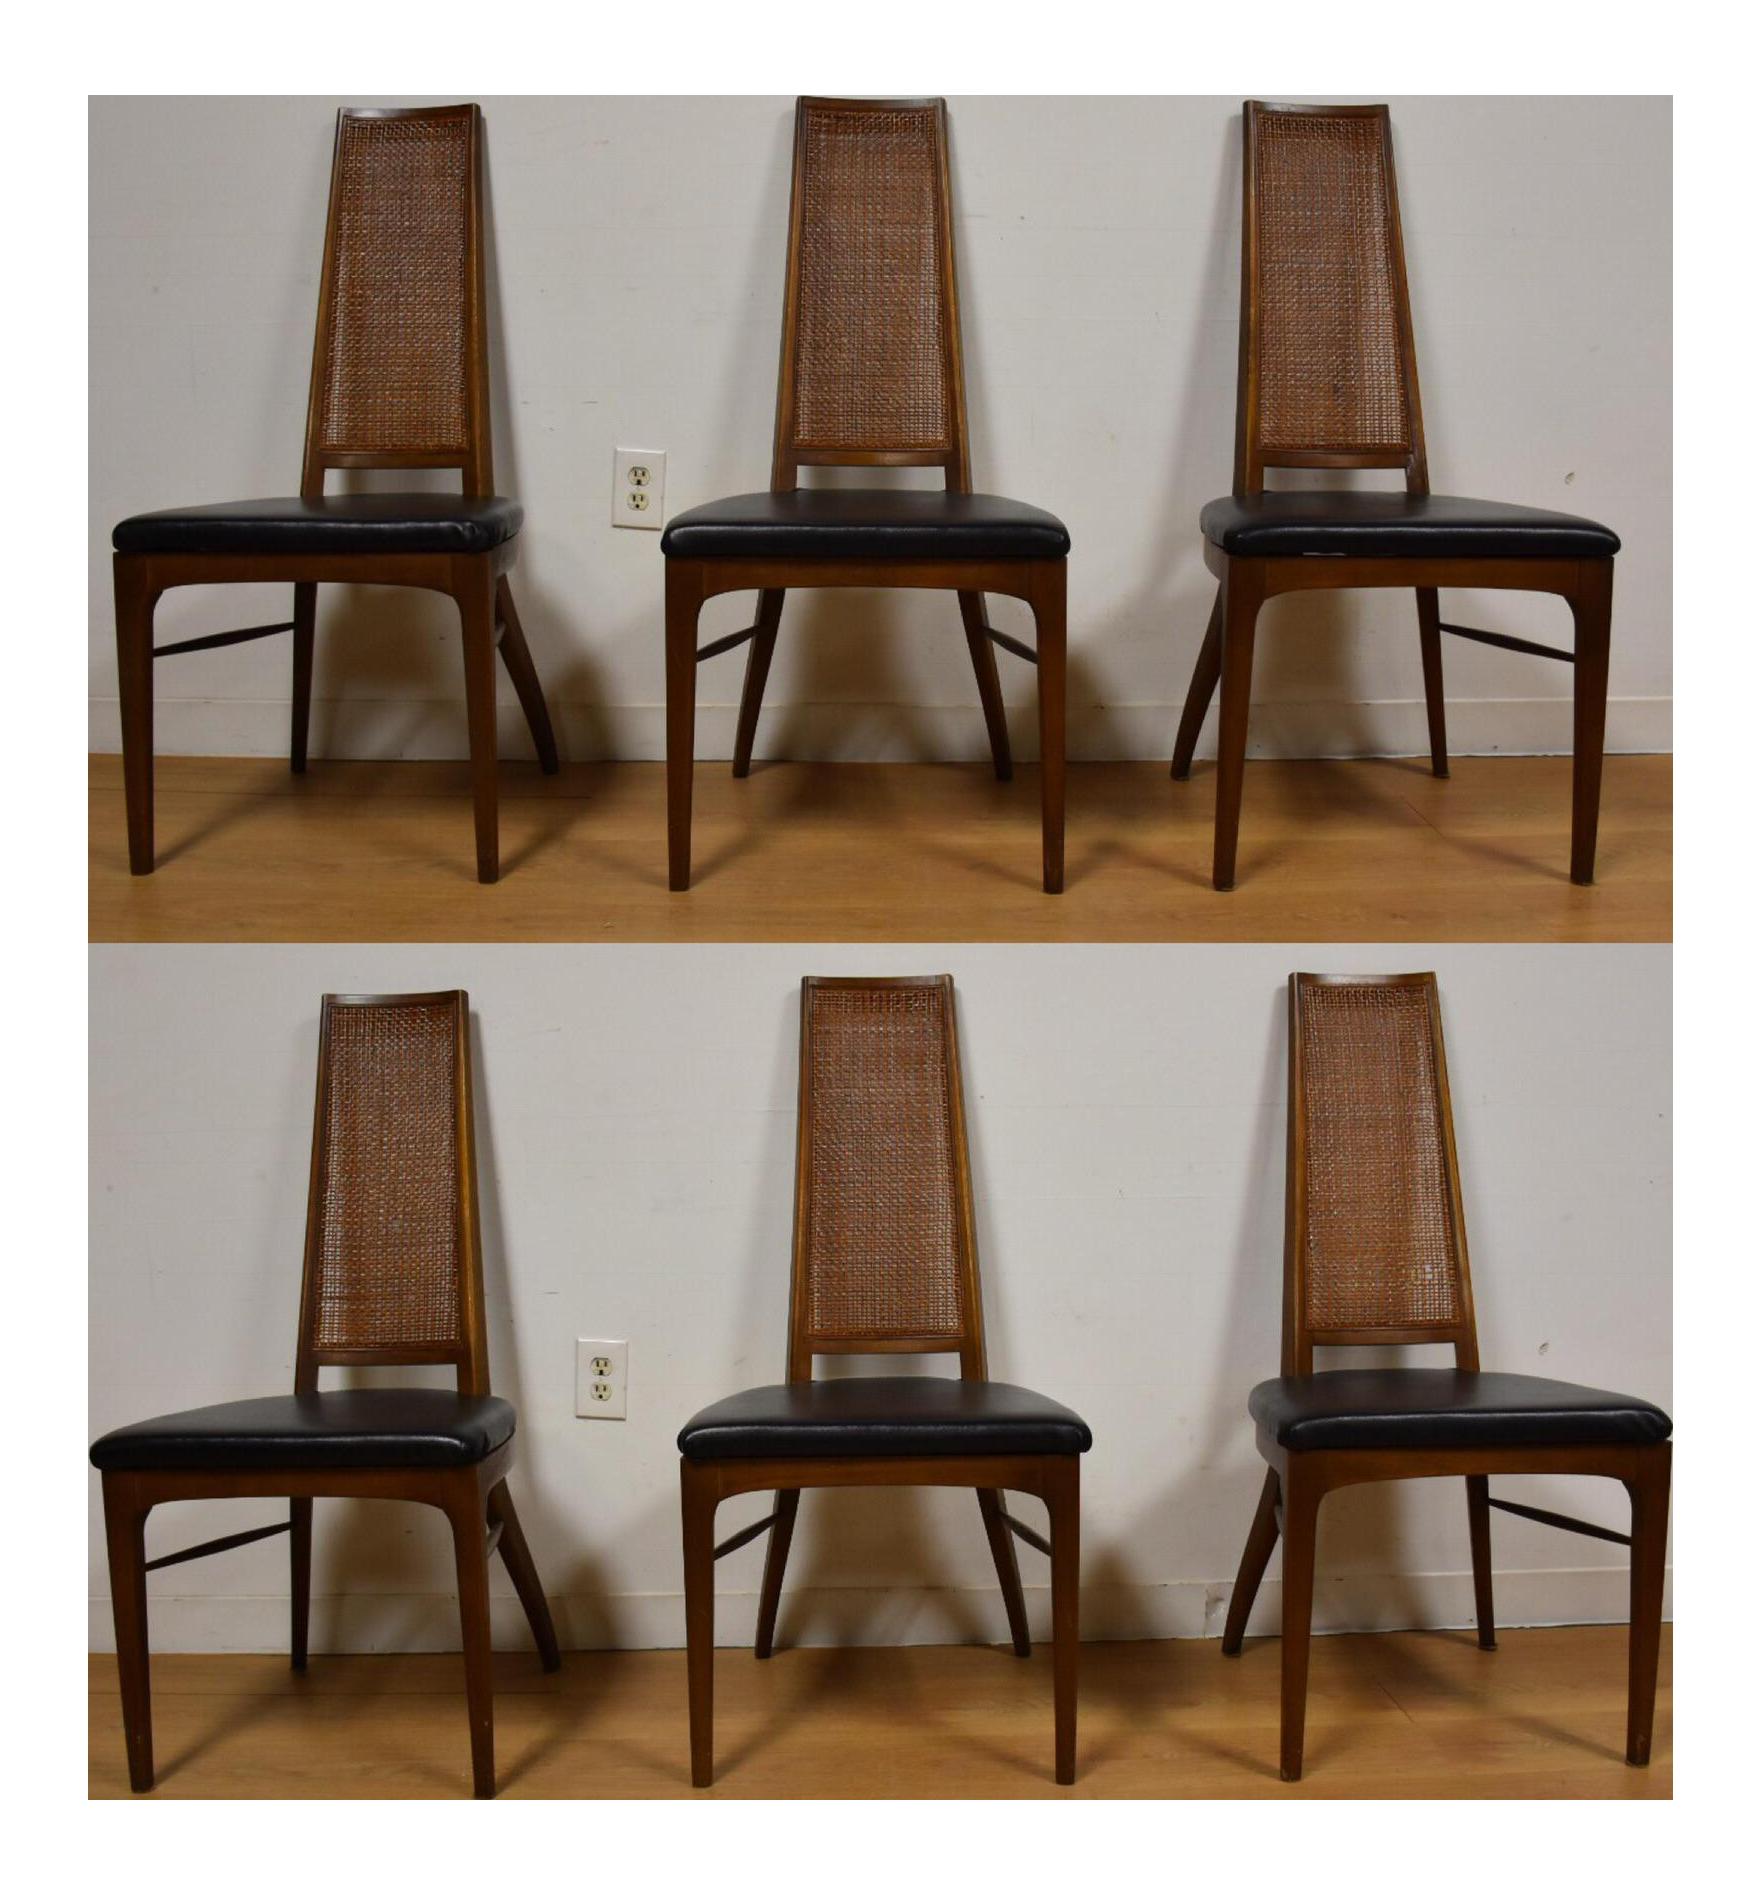 Lane Rhythm Black Vinyl Dining Chairs Set of 6 Chairish : ab1b444f b8b8 4b08 a894 88155e787609 from www.chairish.com size 1761 x 1894 png 1998kB